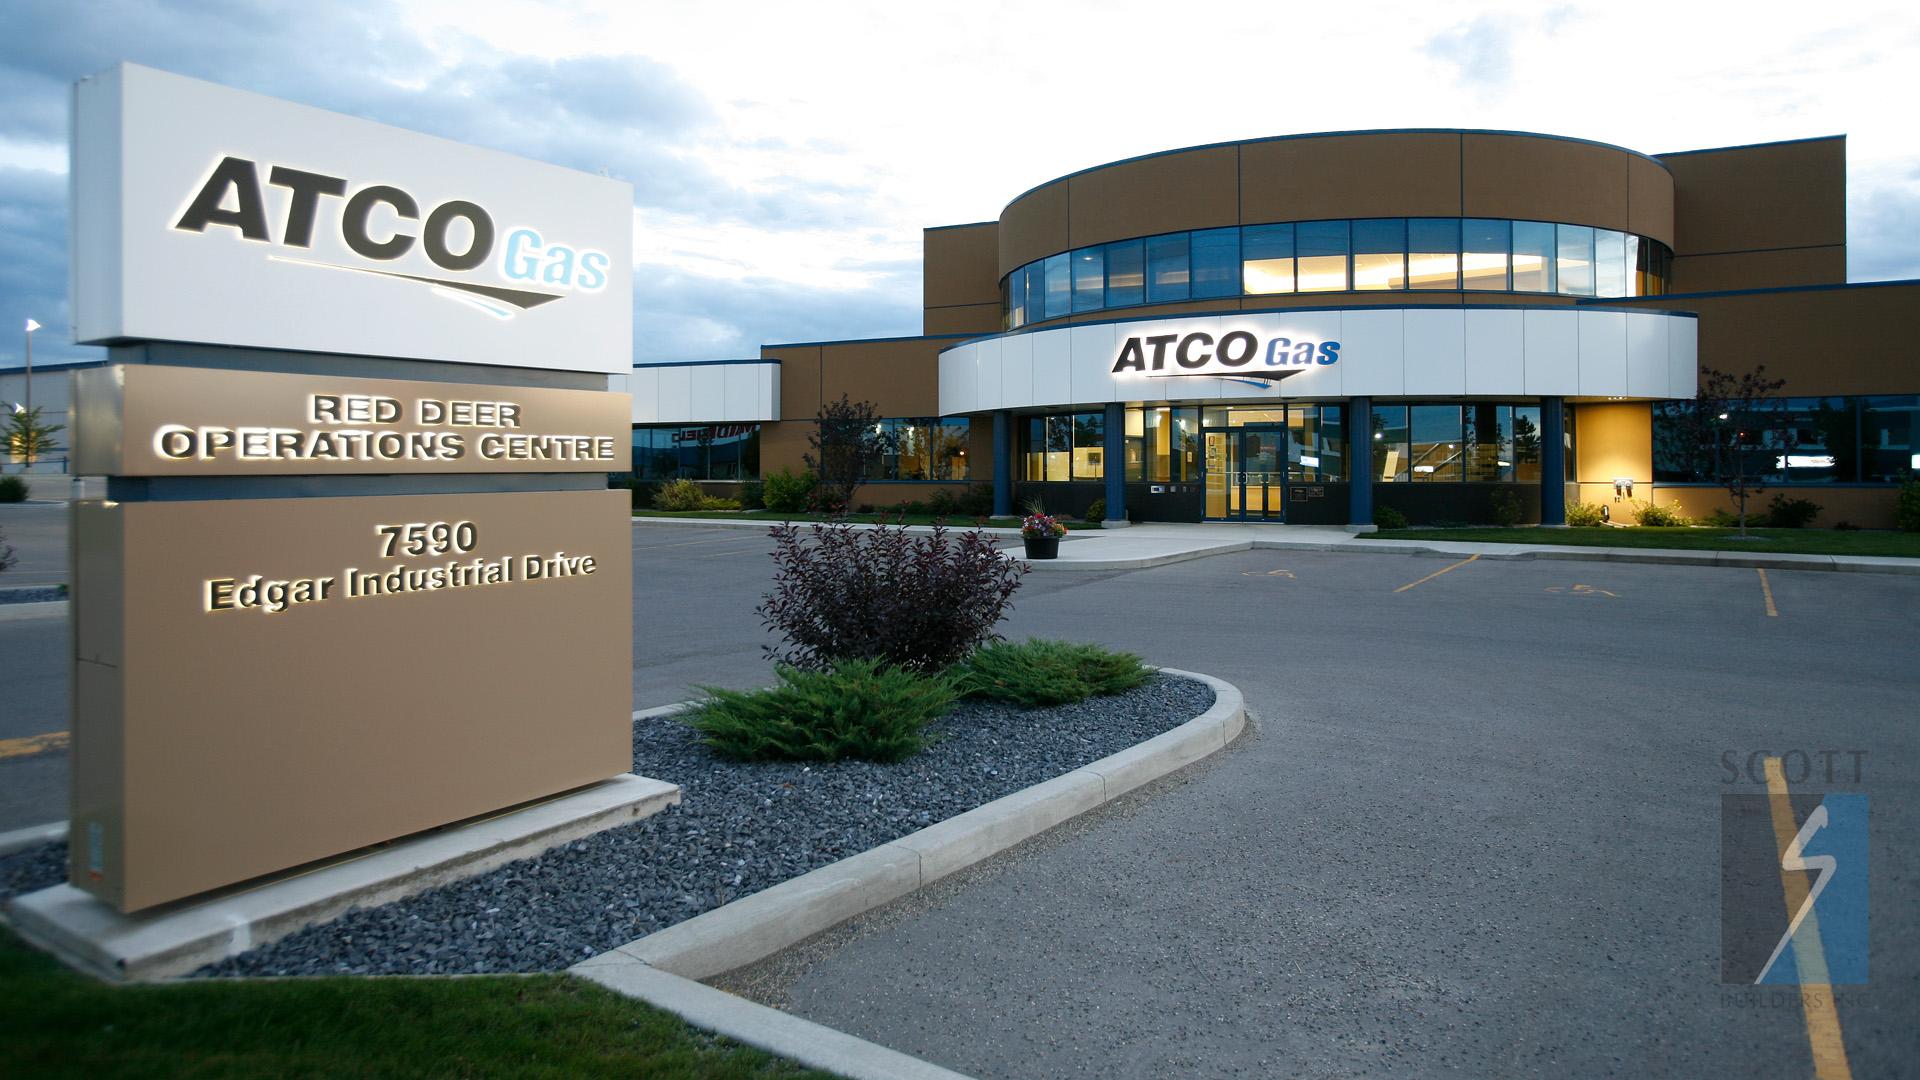 847 Atco Gas Red Deer (4)